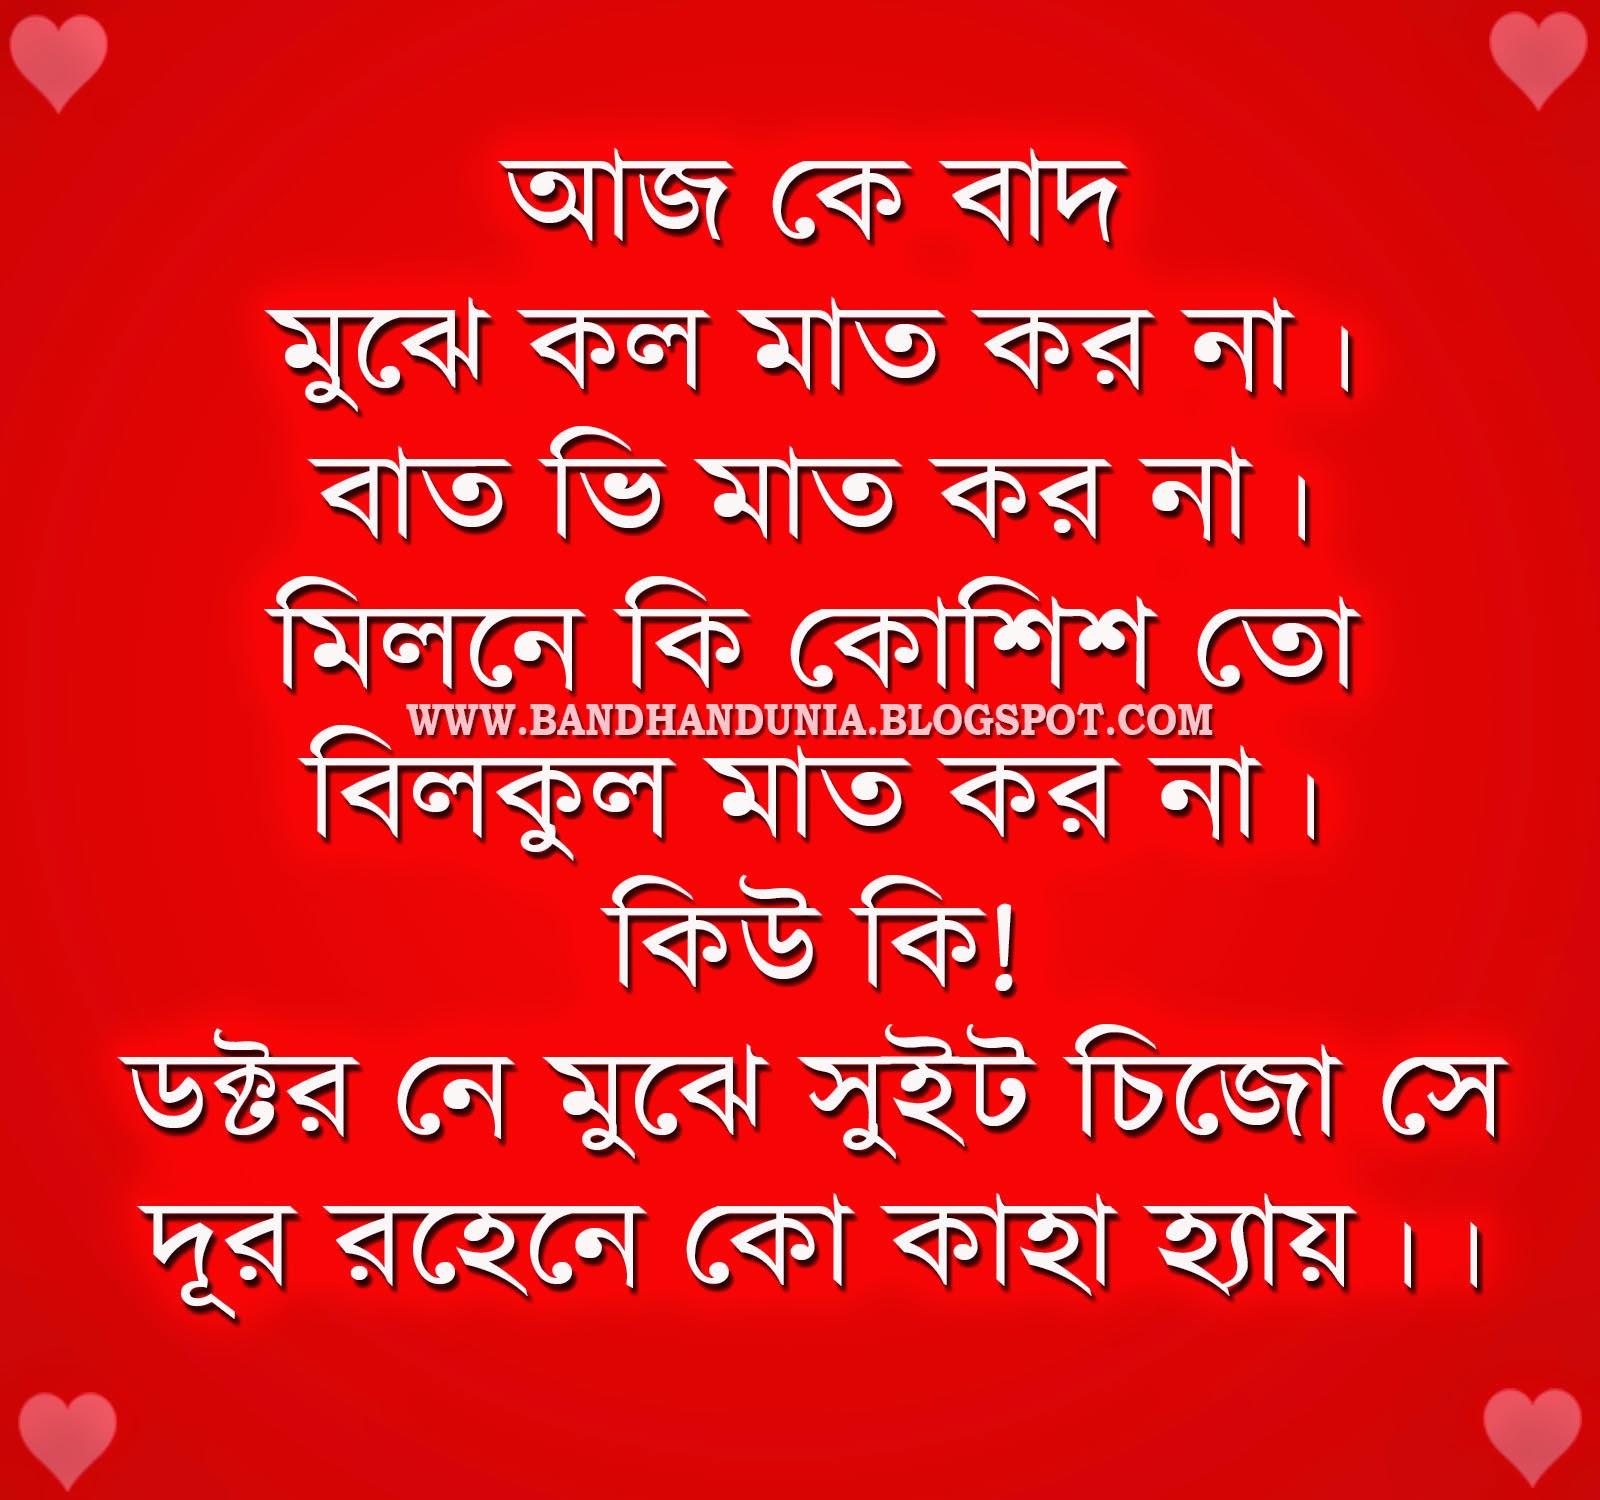 Good Wallpaper Love Hindi - aj%2Bke%2Bbad  Photograph_44893.jpg